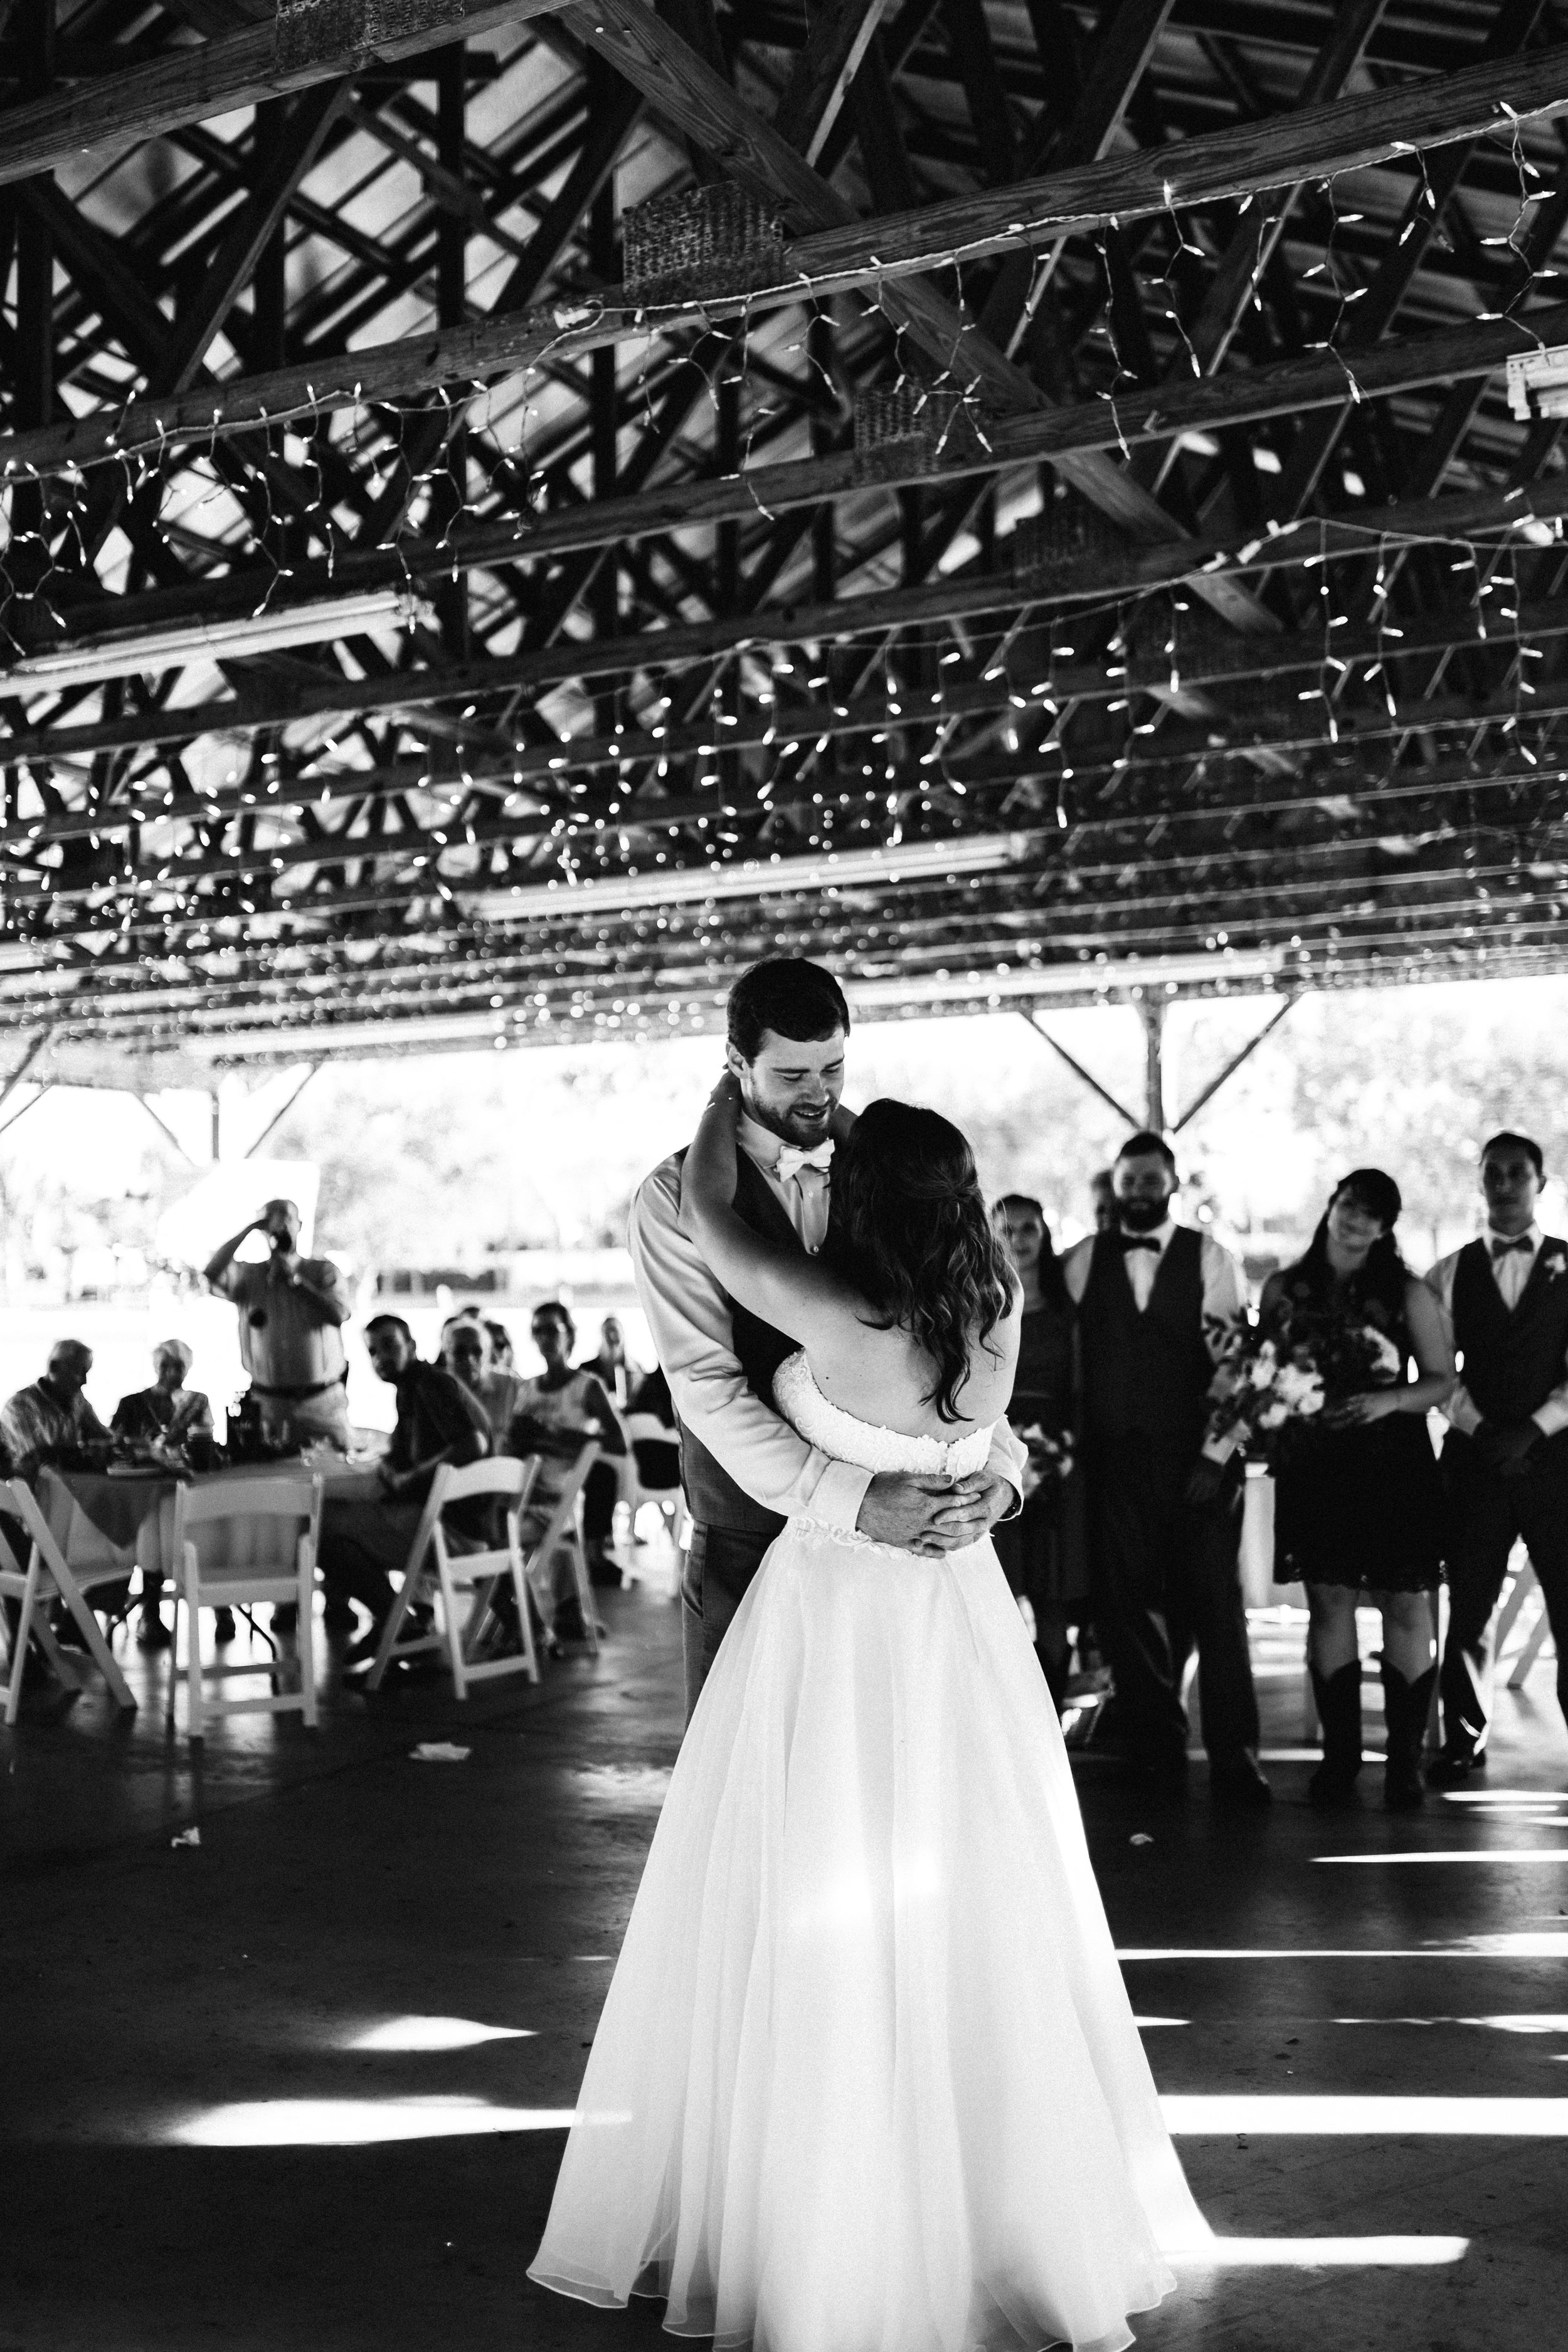 2017.10.14 Samantha and Matthew Crabtree Sarasota Wedding (446 of 708).jpg